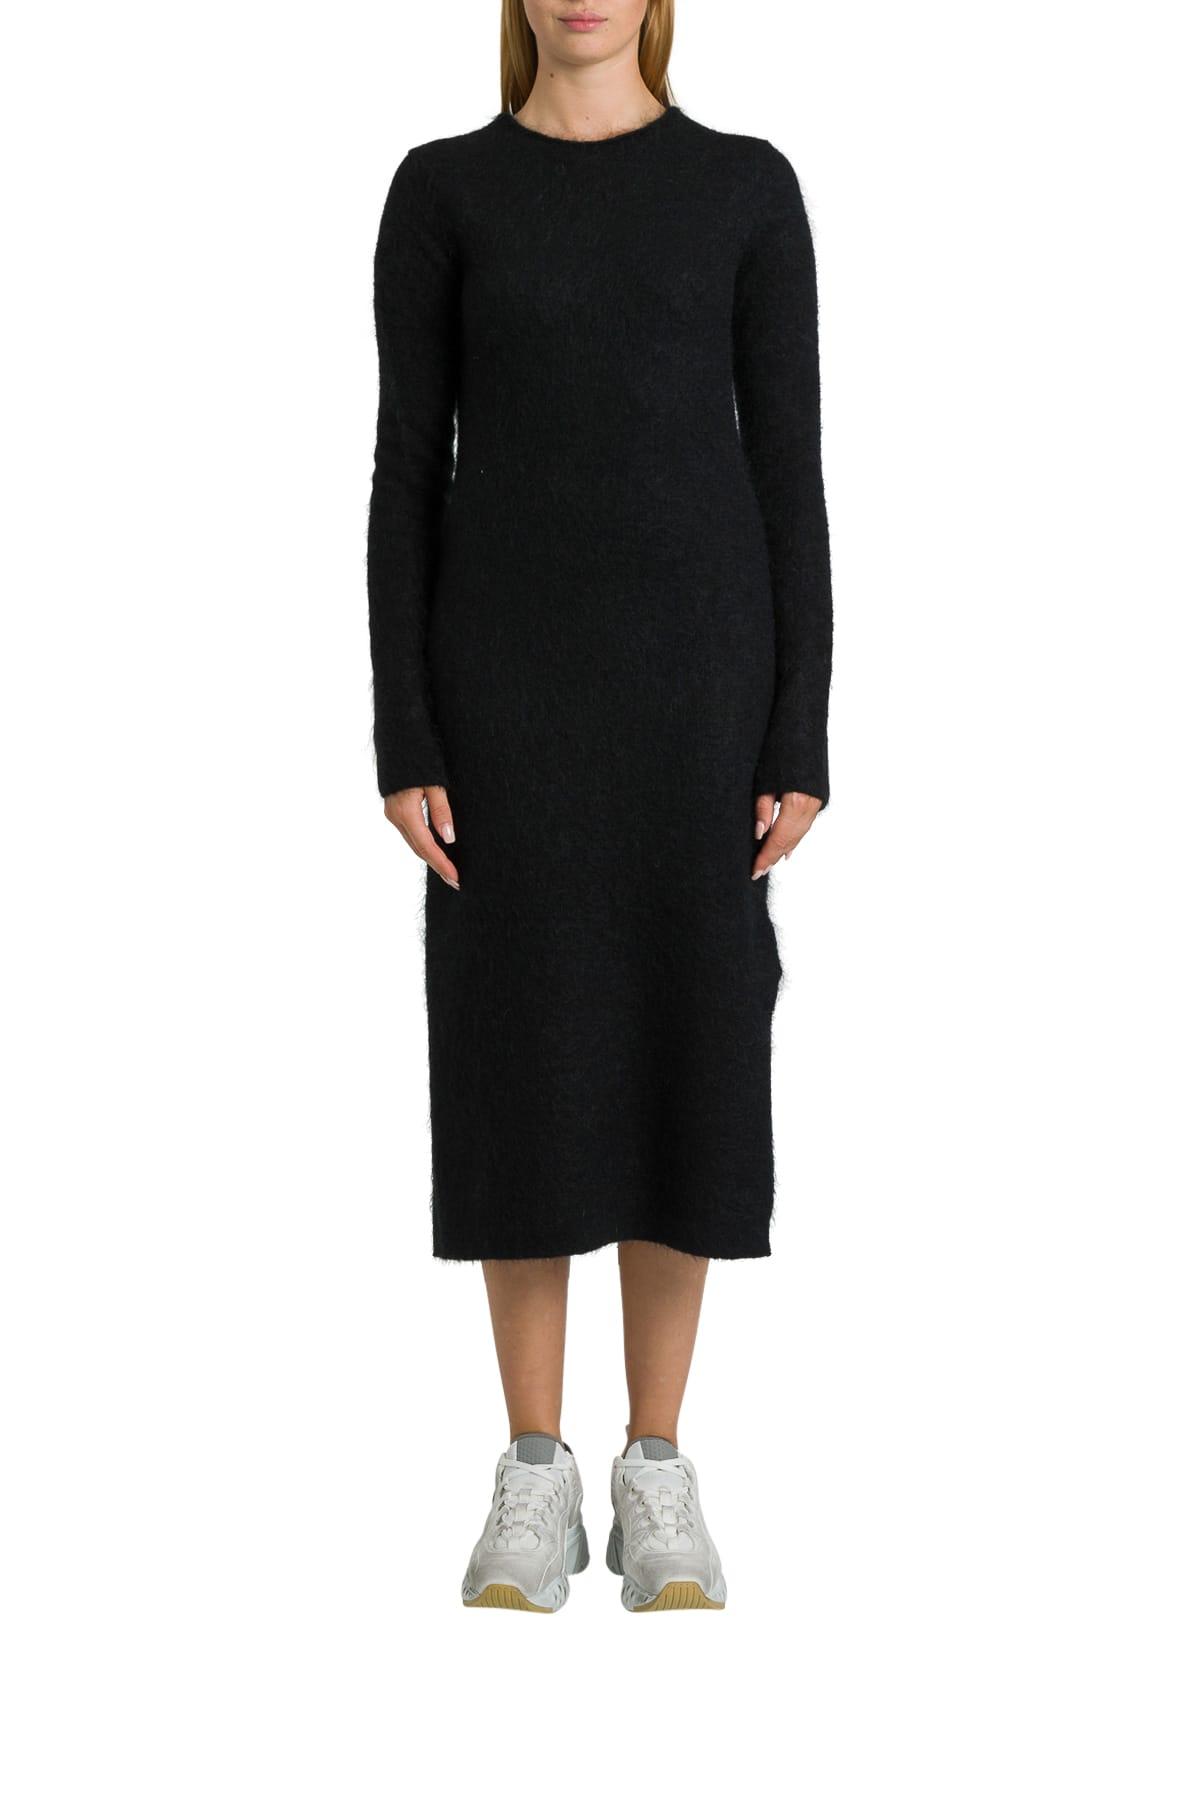 Acne Studios Khatilde Dress